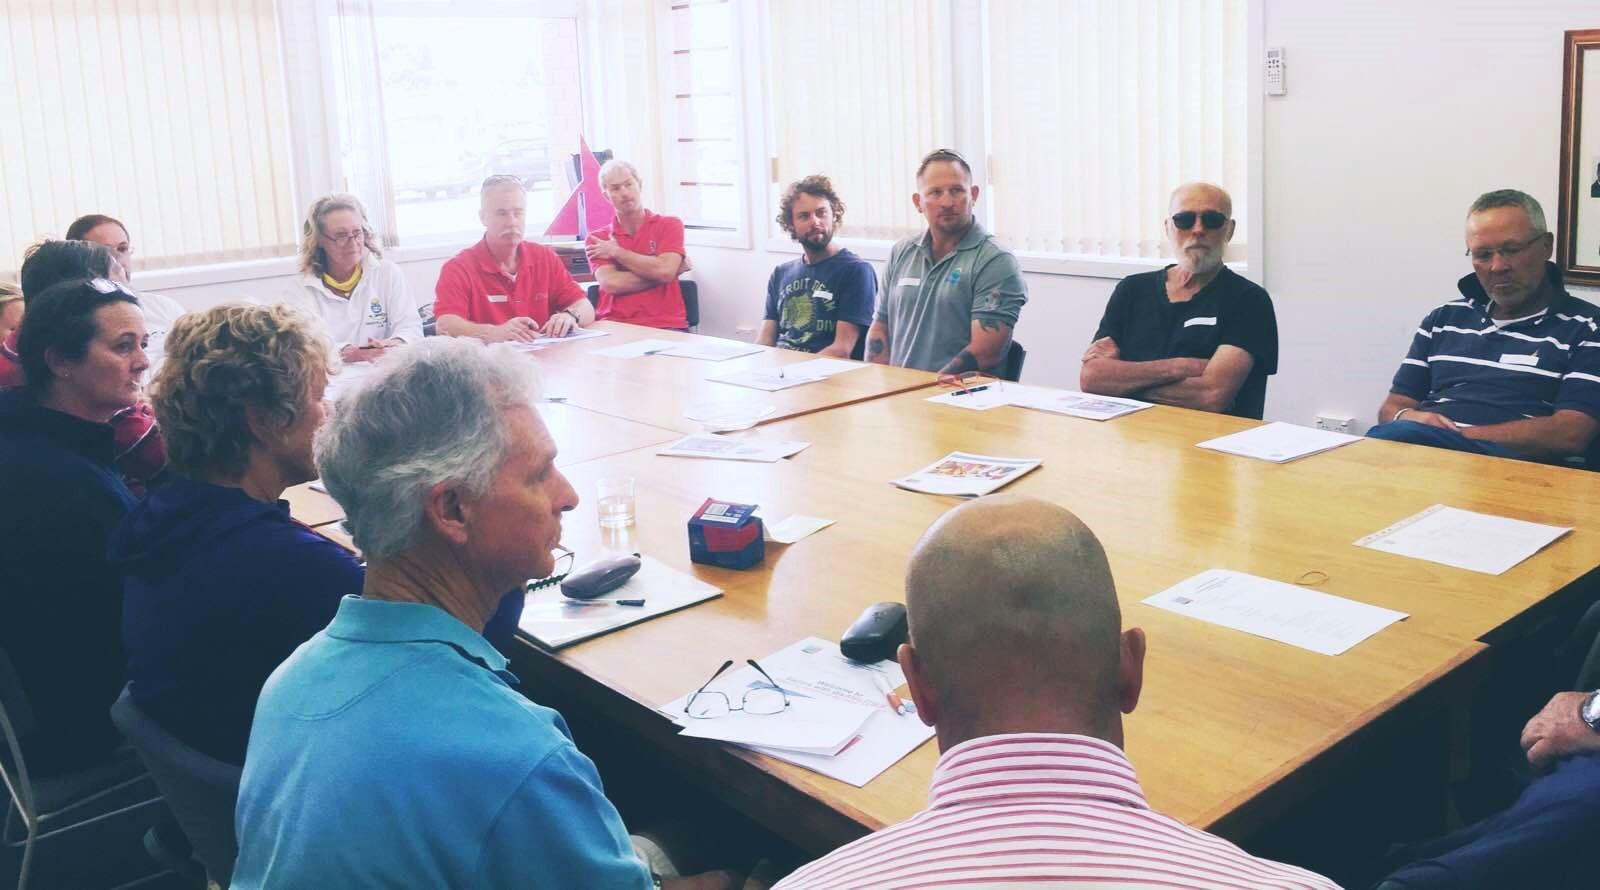 Orientation in Hobart with volunteers